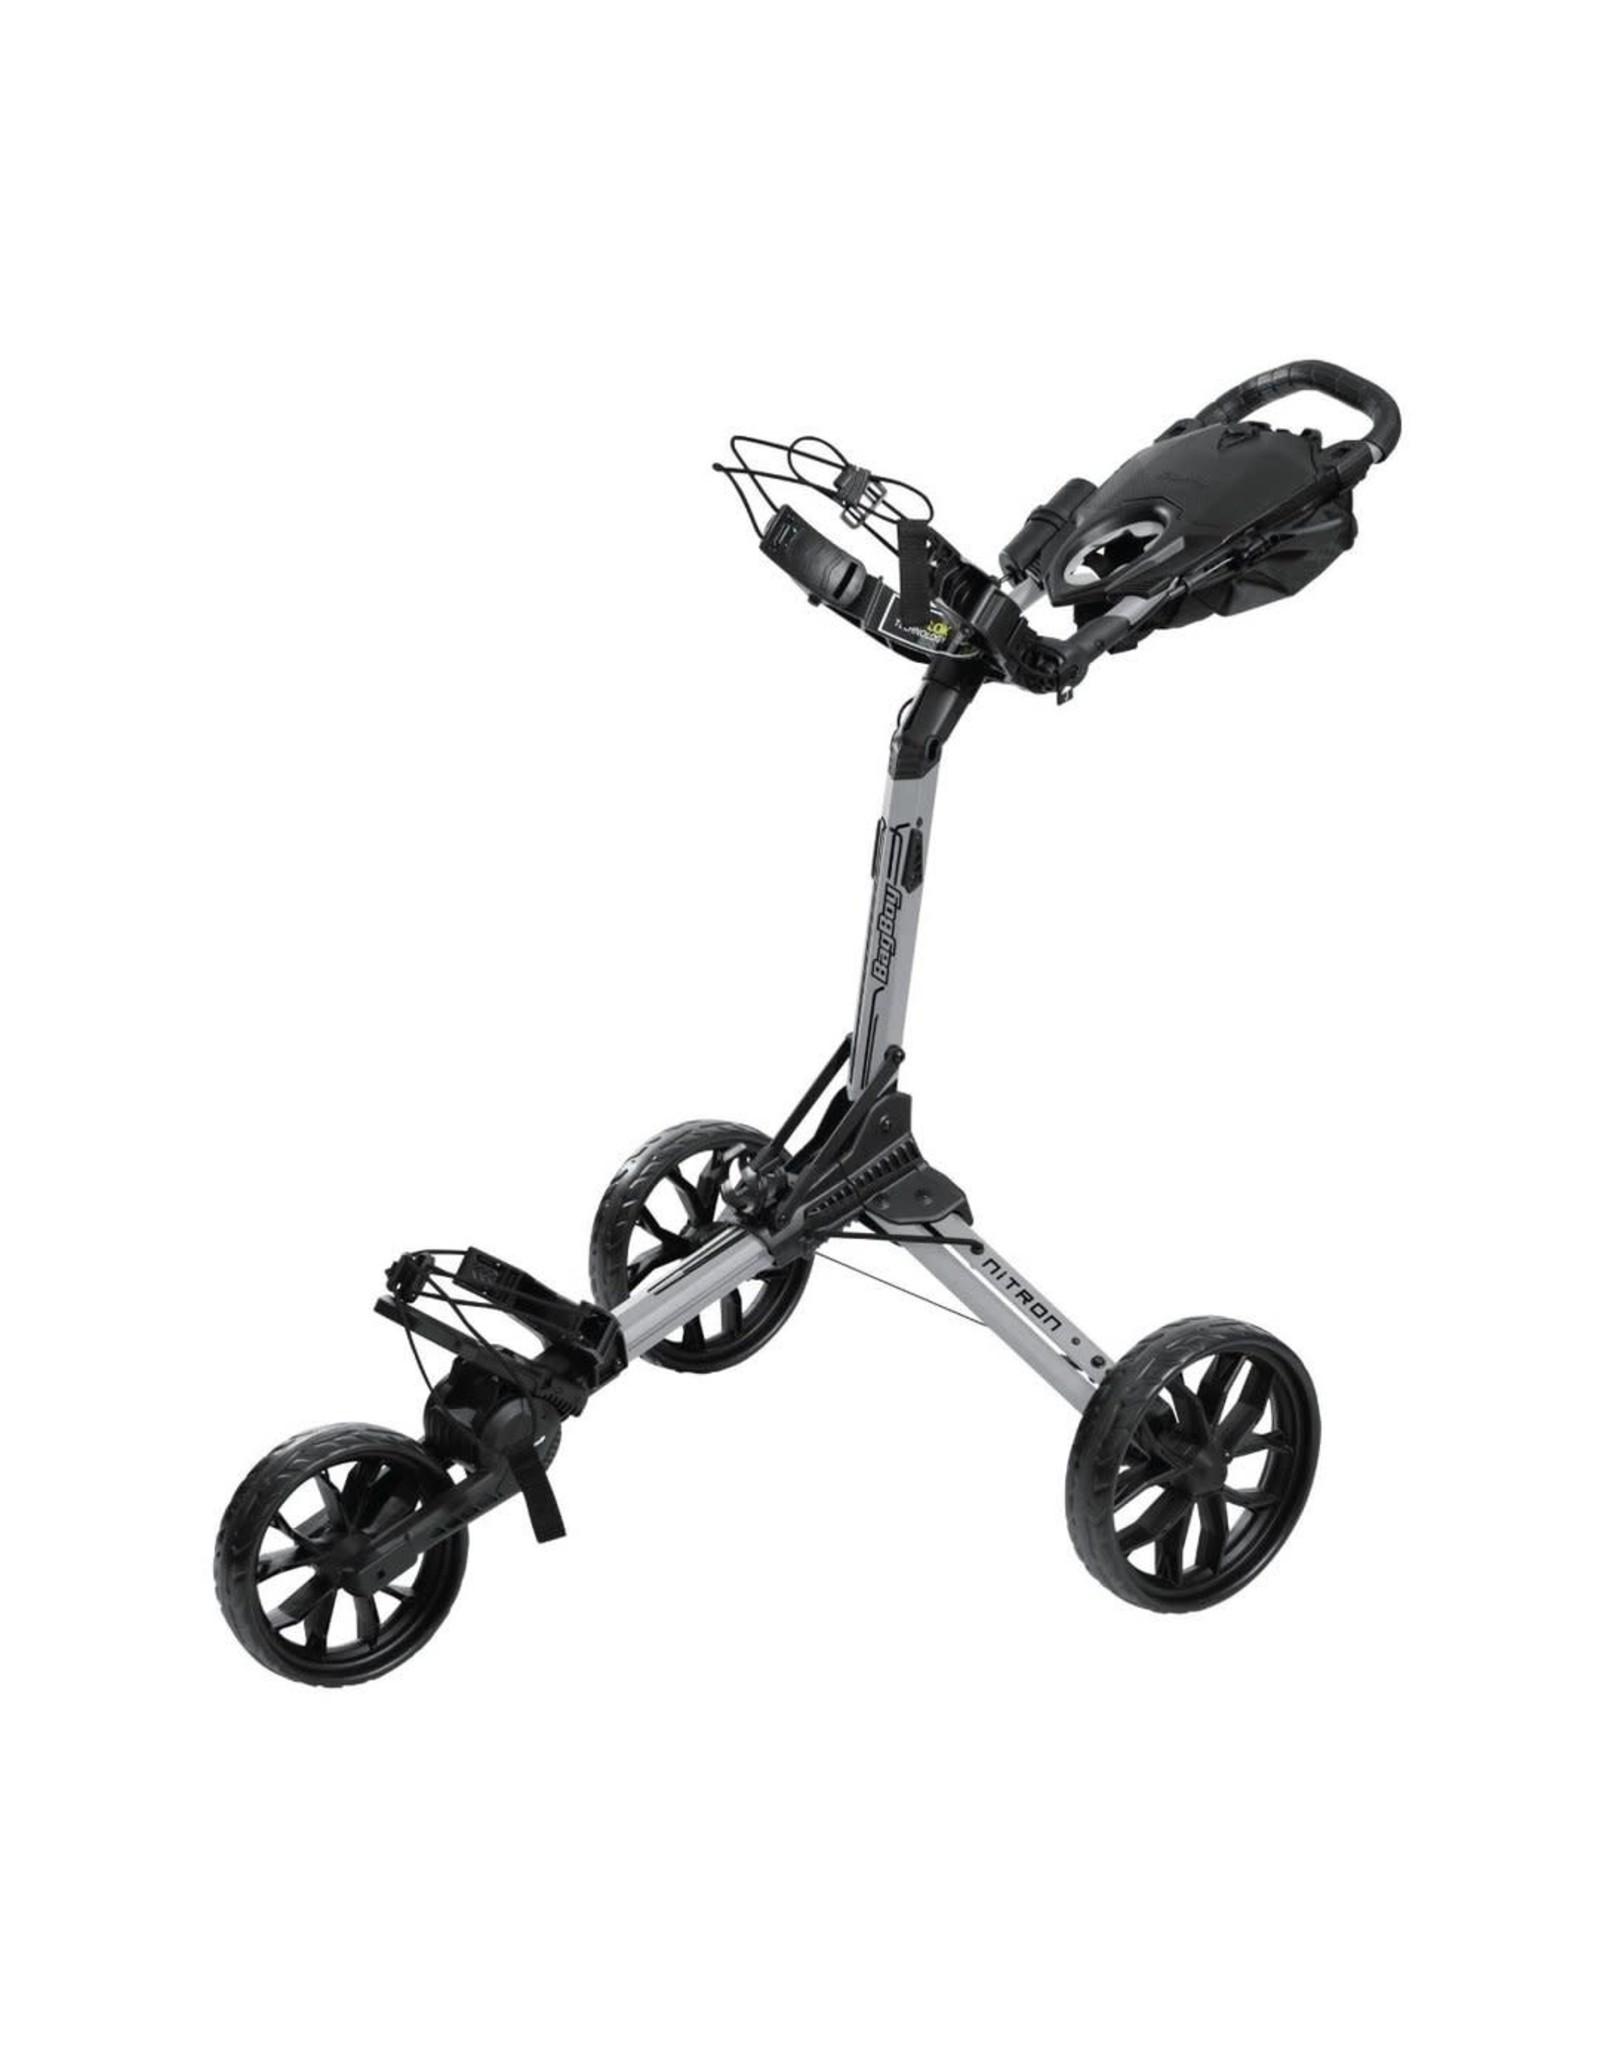 Bag Boy Bag Boy Nitron Push Cart